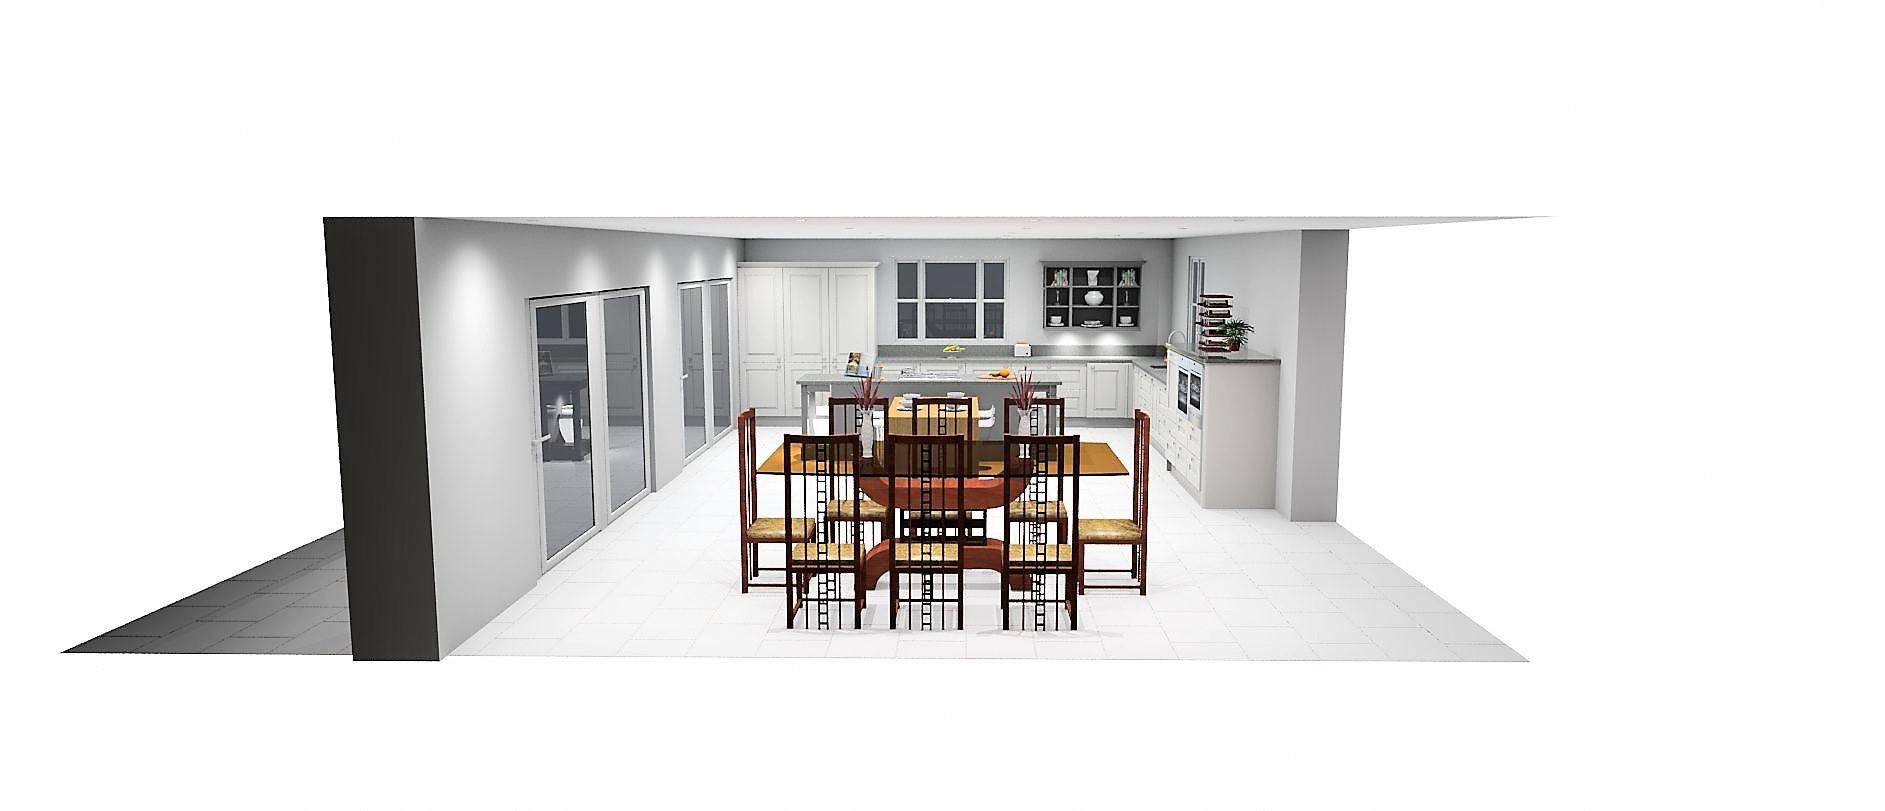 Hartigan Kitchens and Bedrooms Cork: CAD Kitchen designs | Bespoke ...